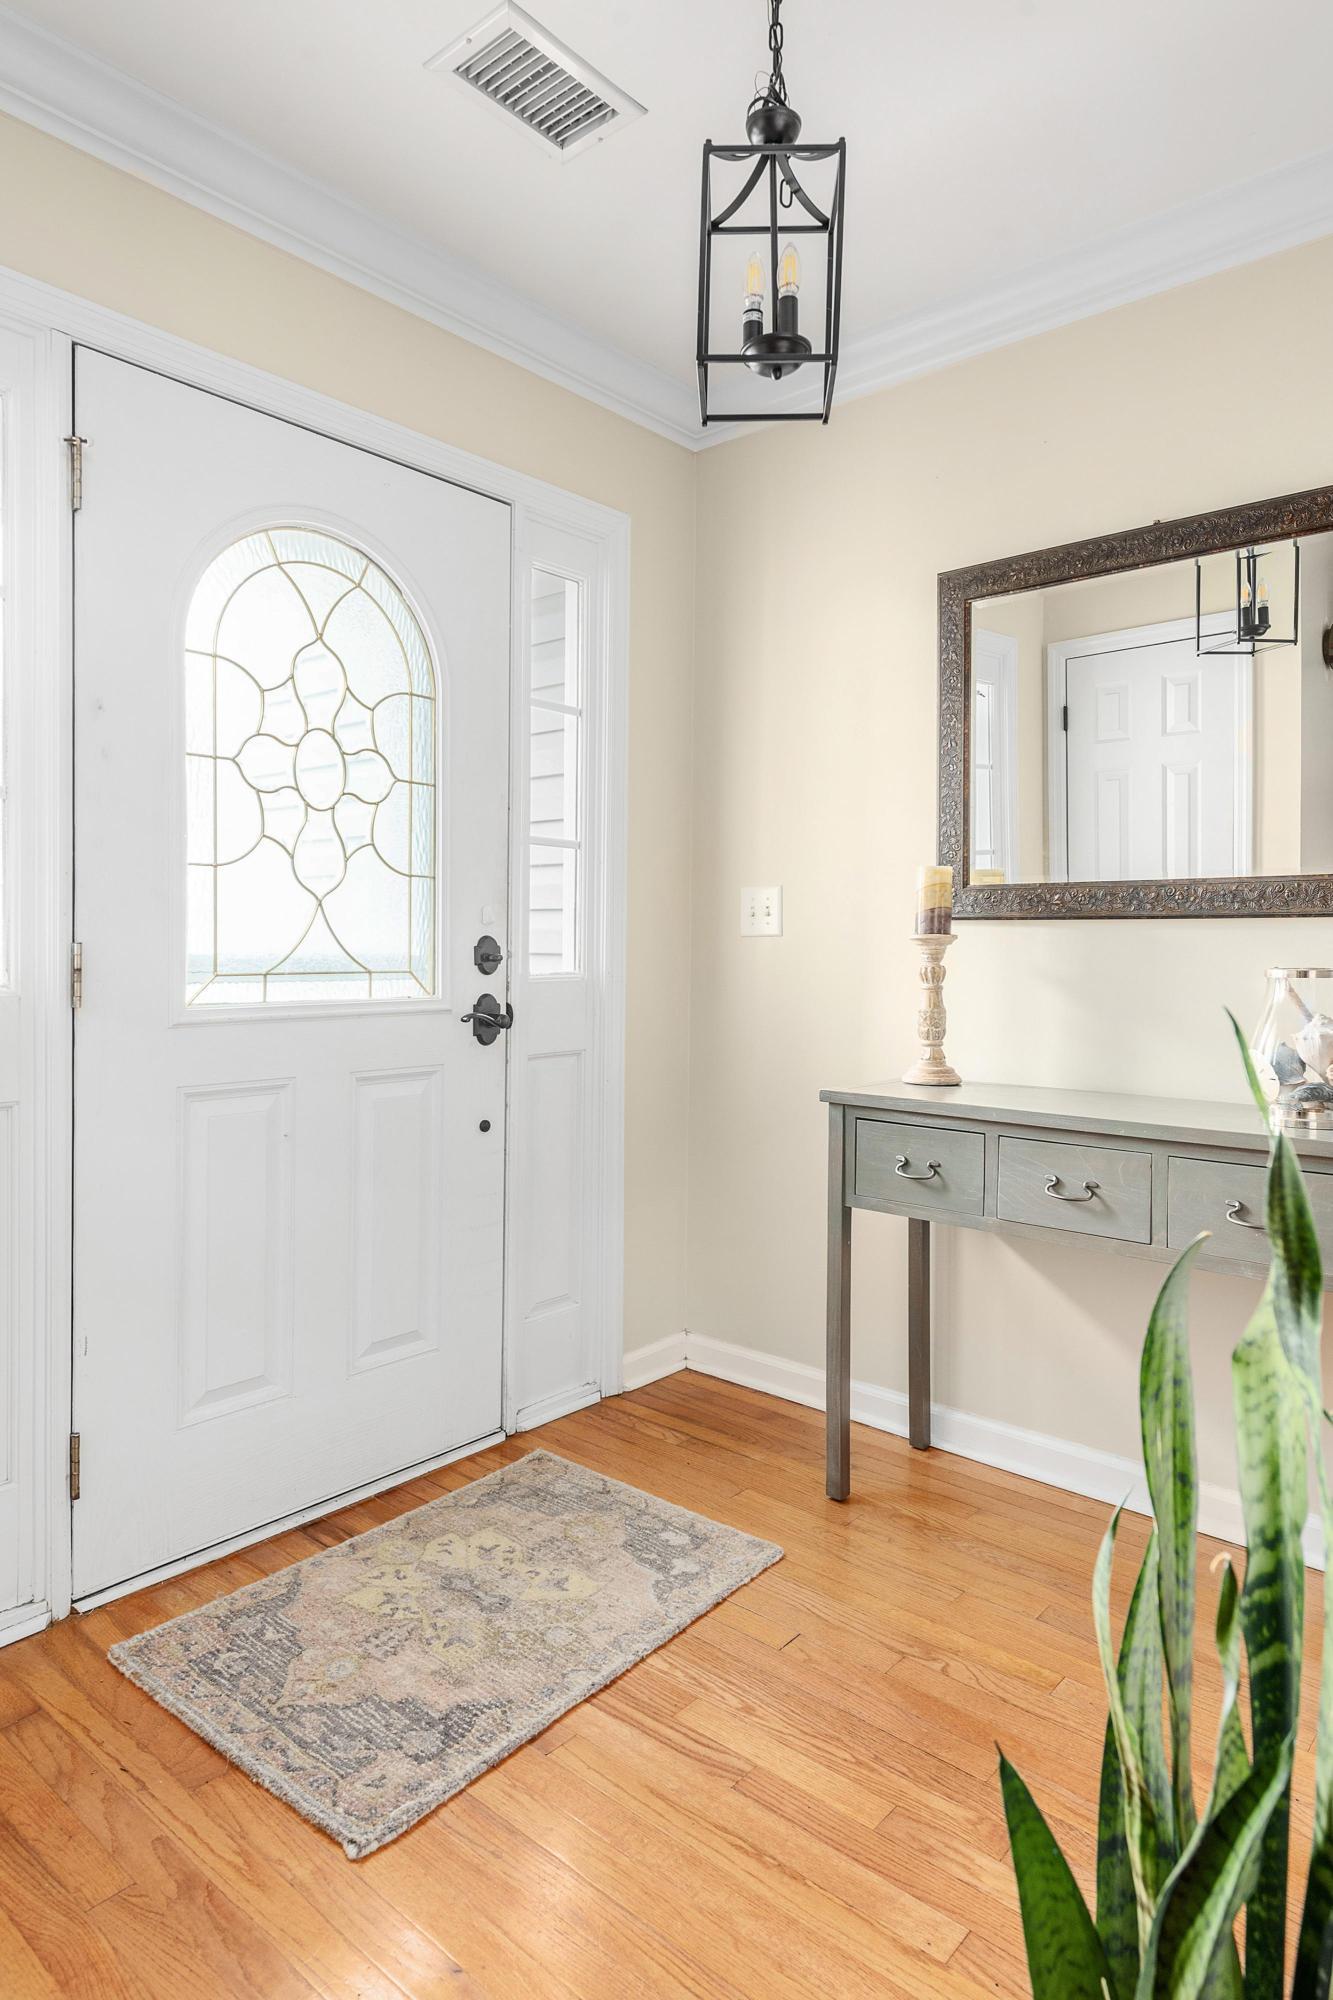 Ocean Neighbors Homes For Sale - 967 Clearspring, Charleston, SC - 6